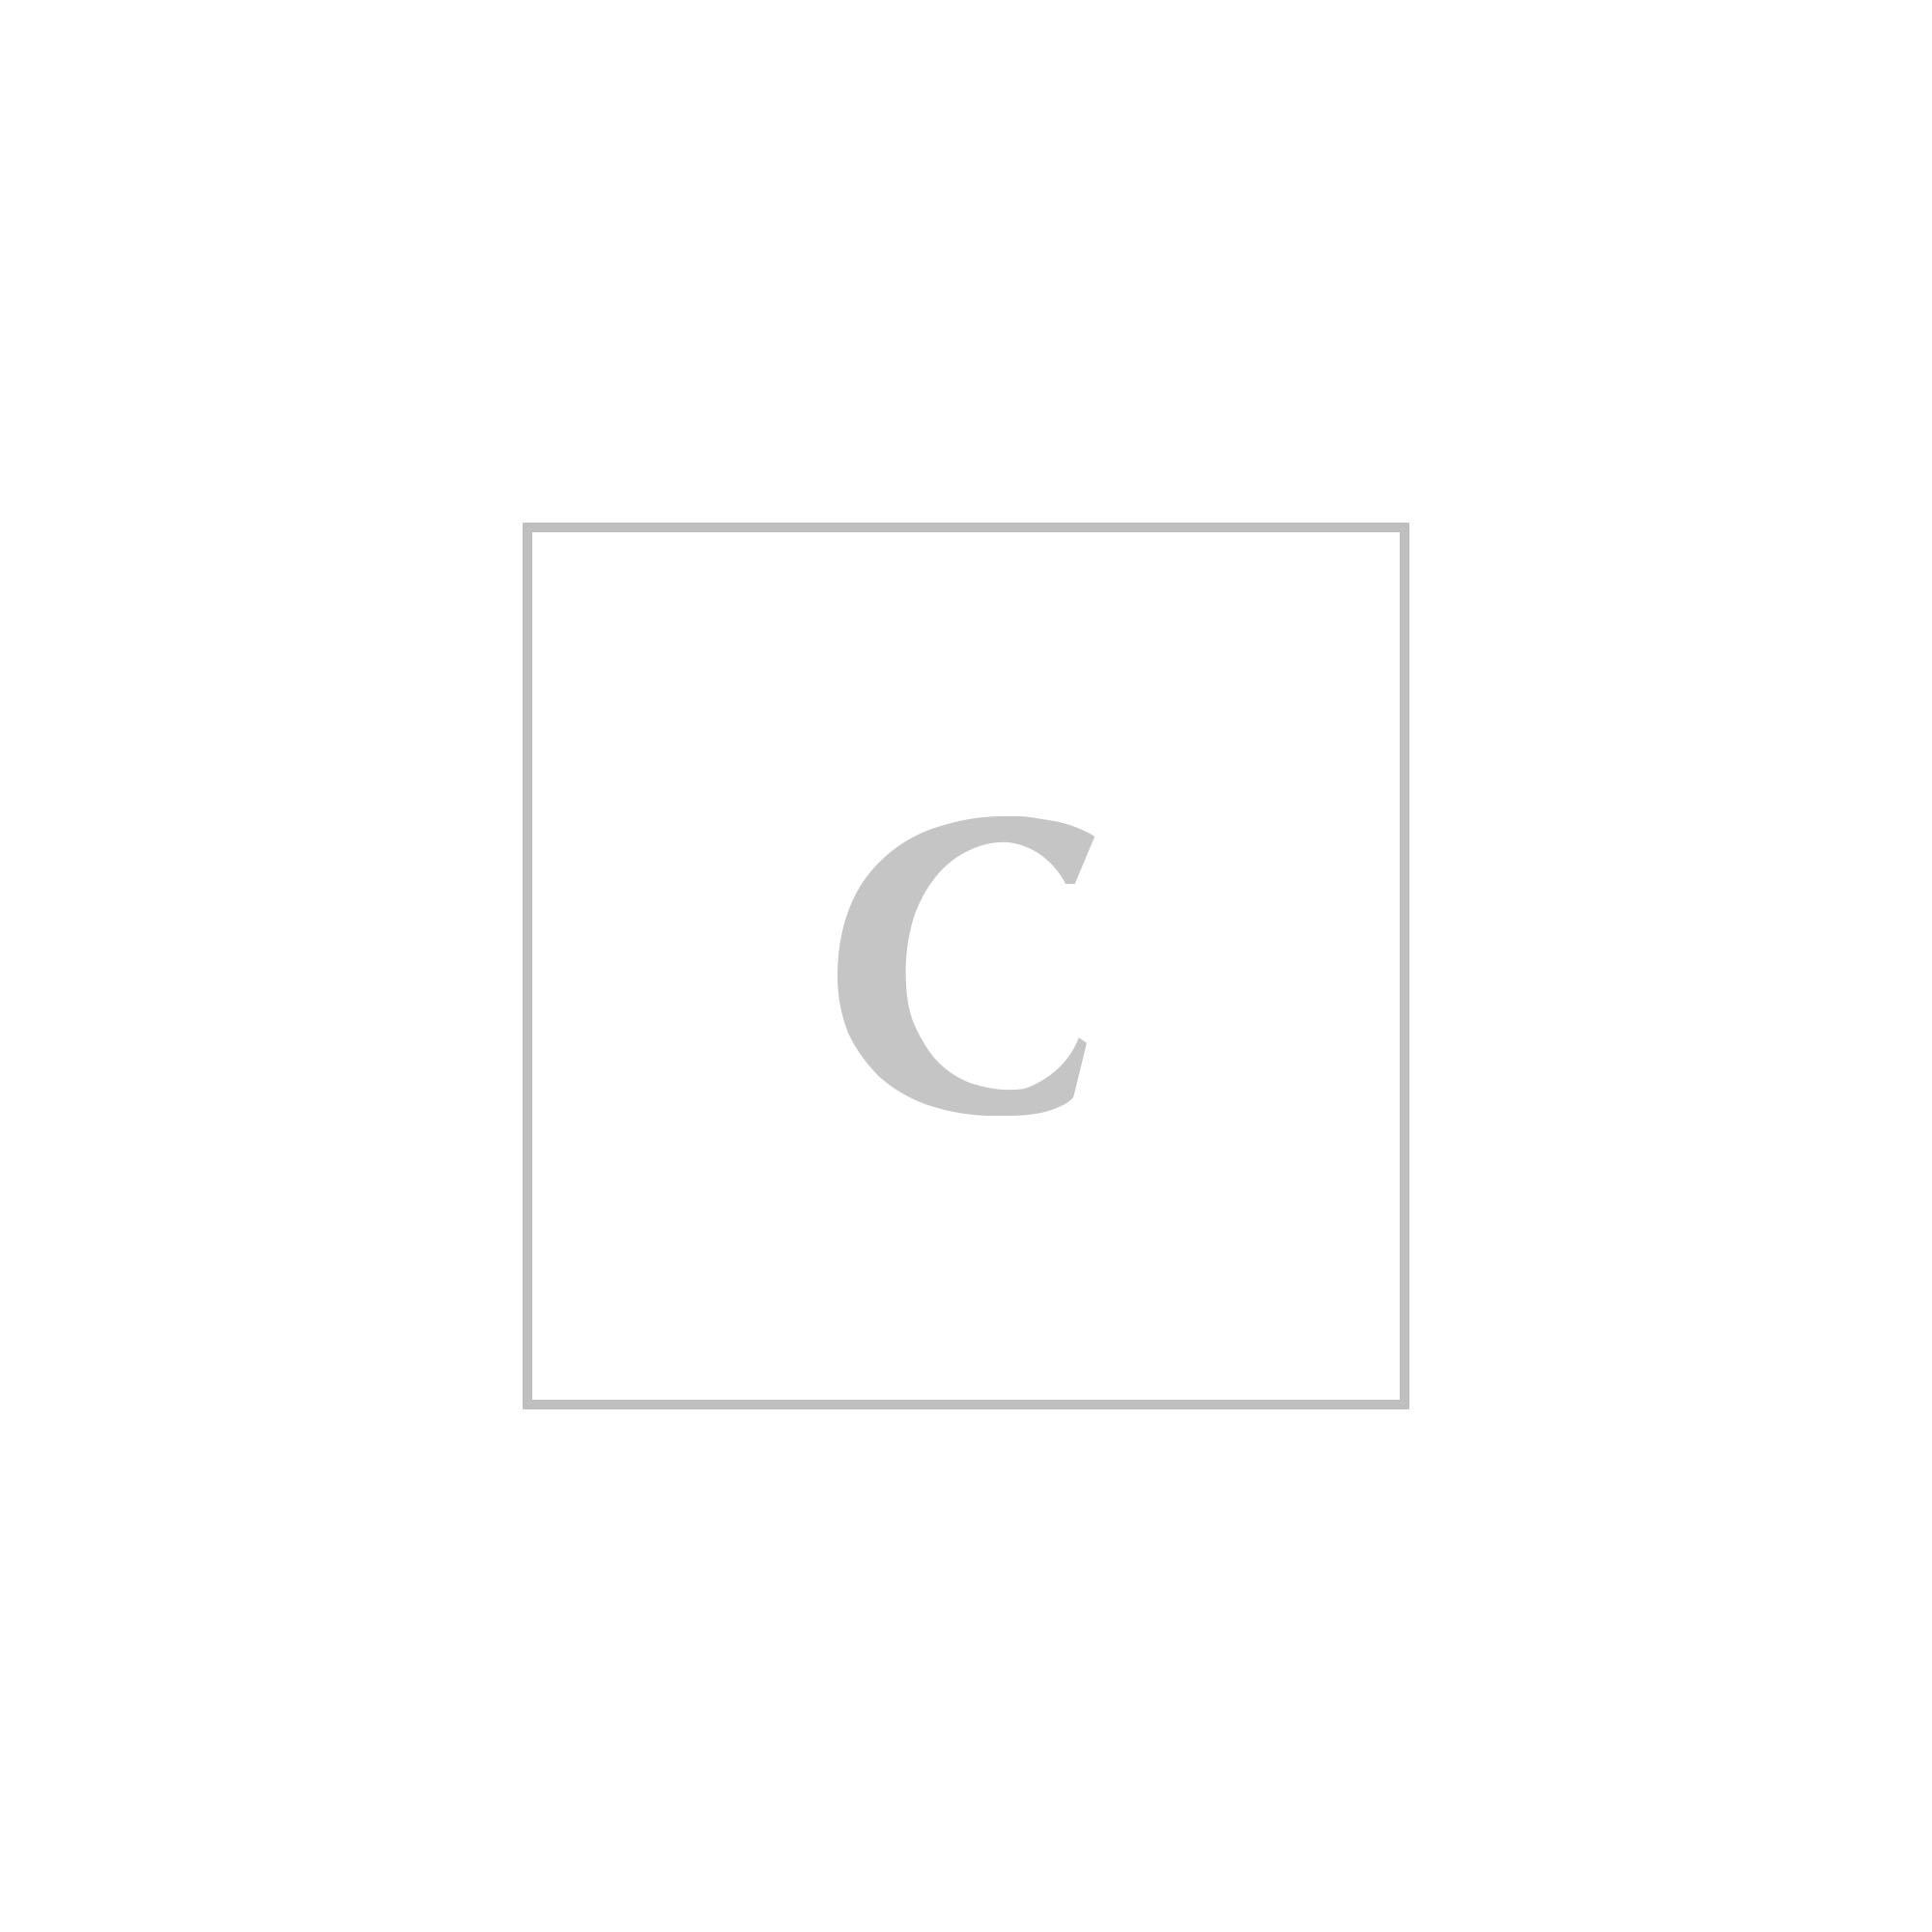 Dolce & gabbana borsa  a mano pelle stampa iguana